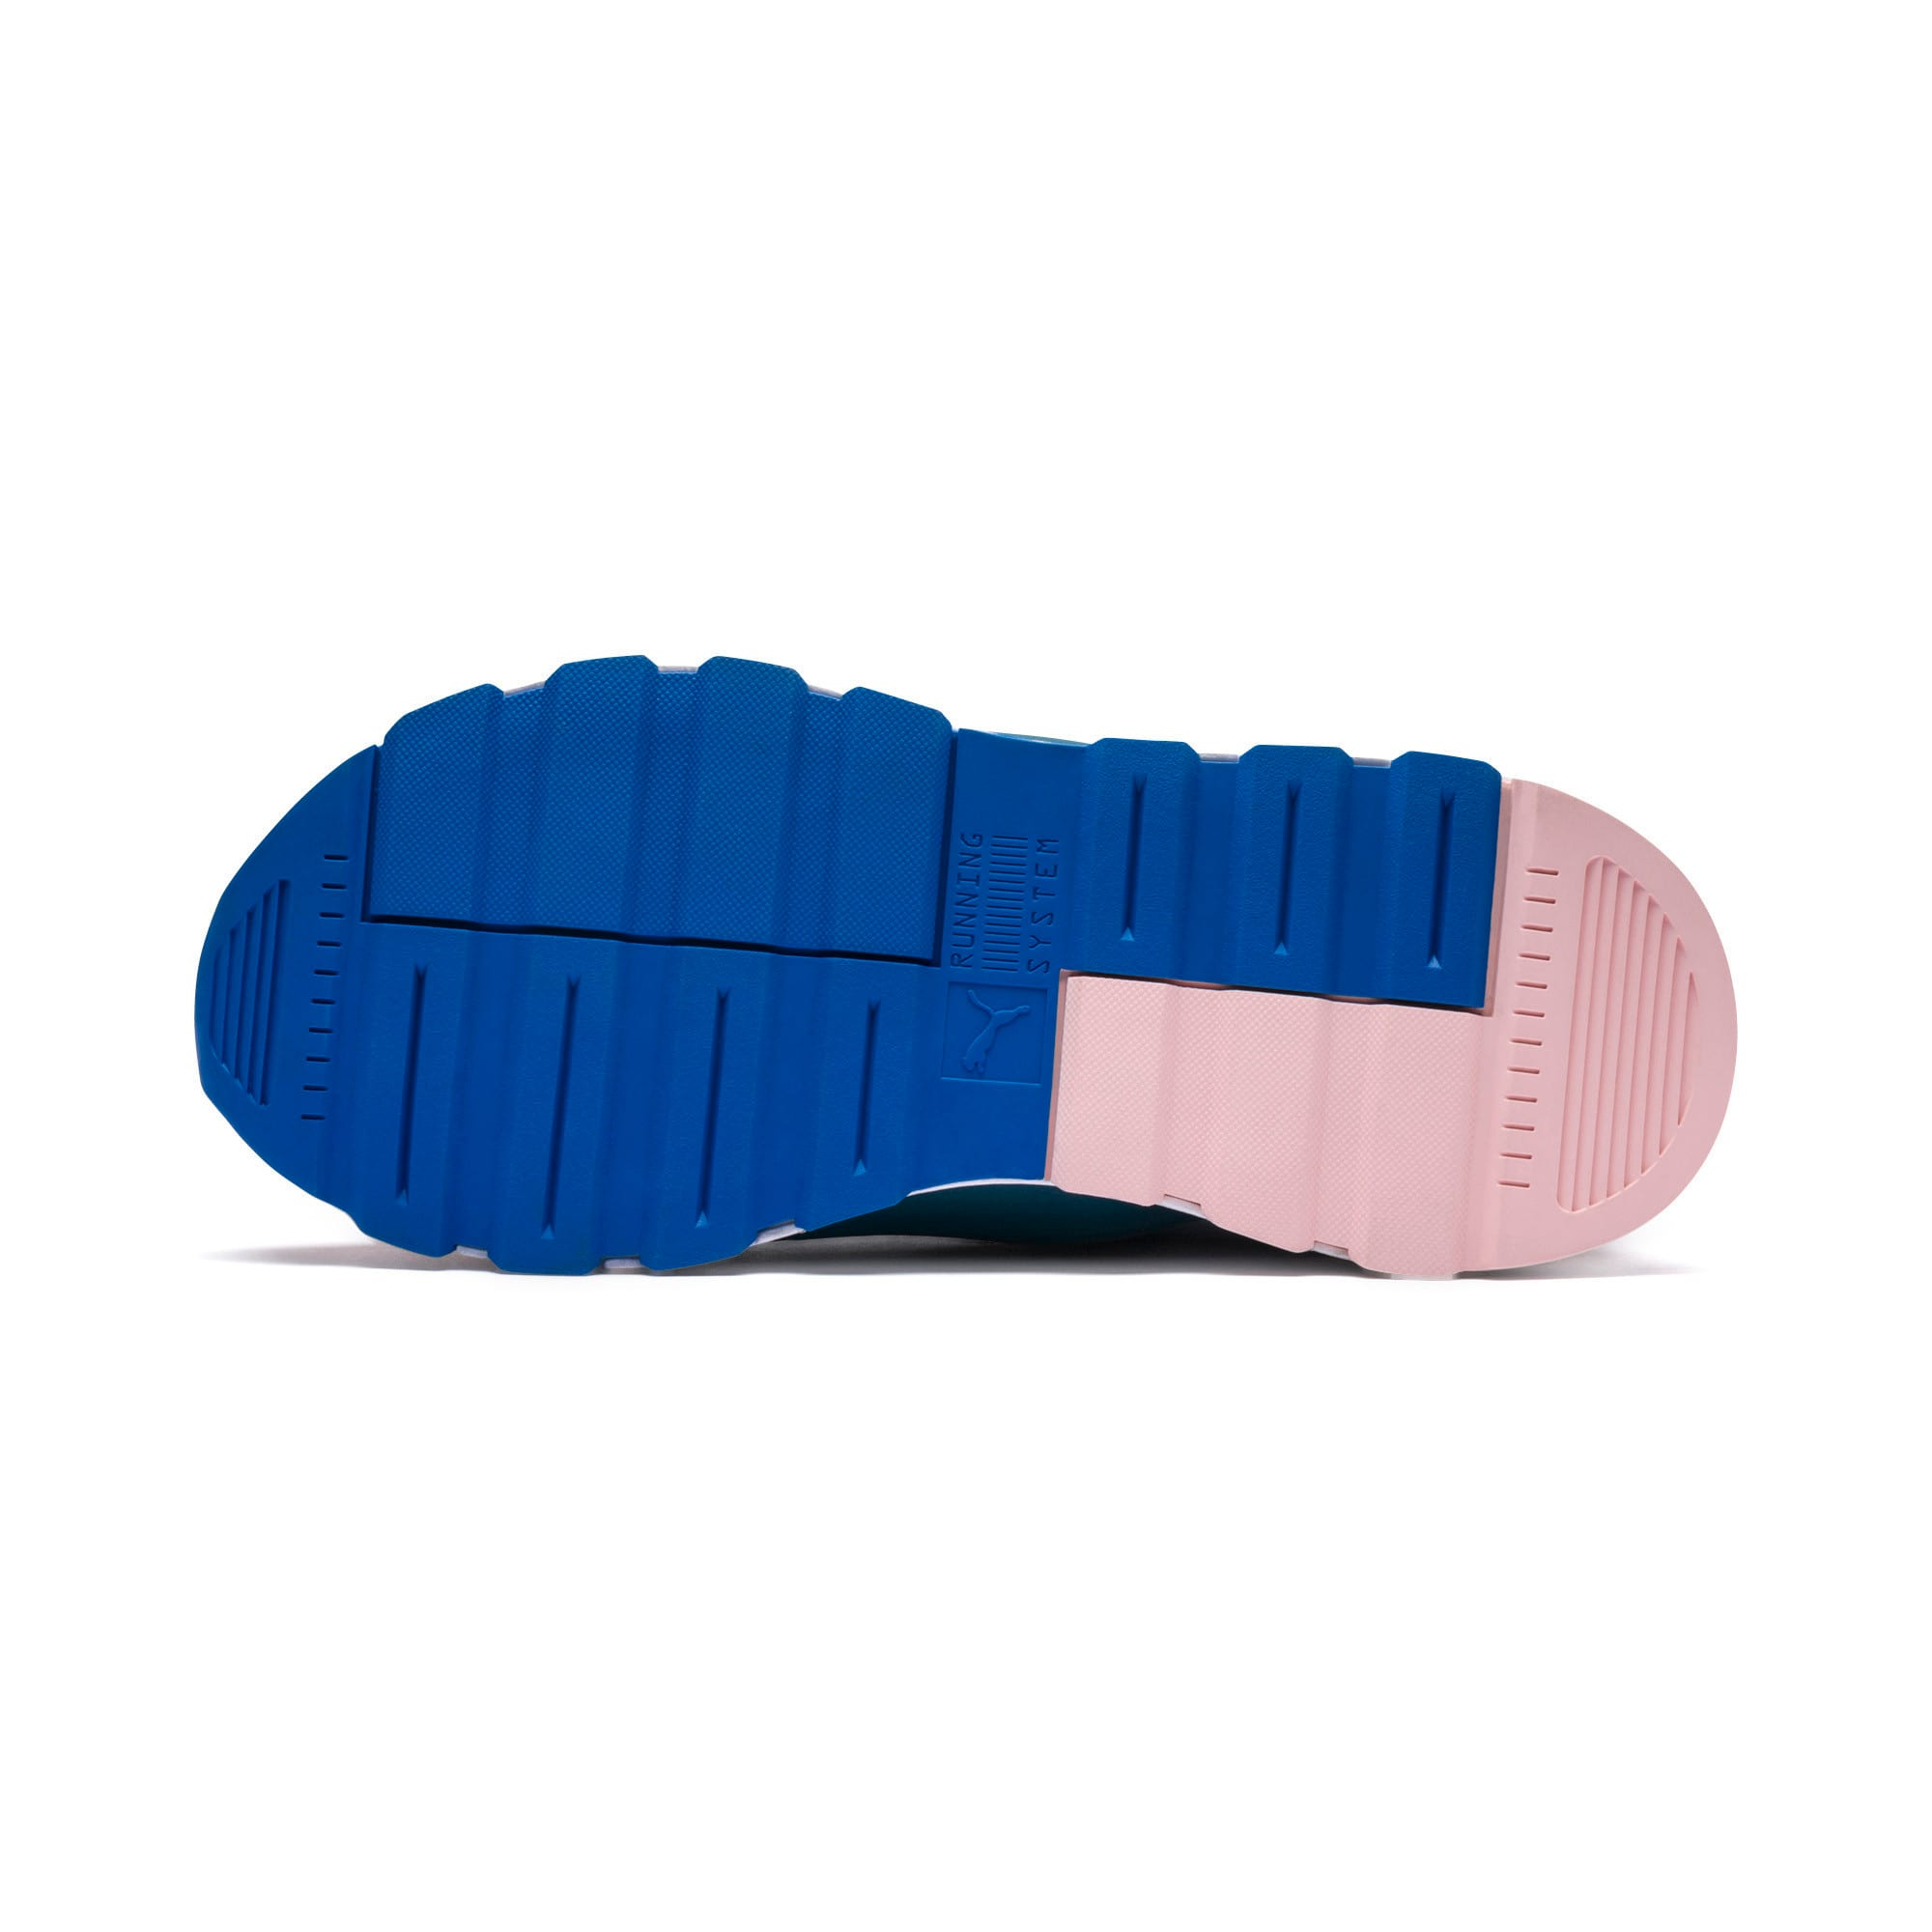 Thumbnail 4 of Sesame Street 50 RS-0 Little Kids' Shoes, Veiled Rose-Indigo-BlueCoral, medium